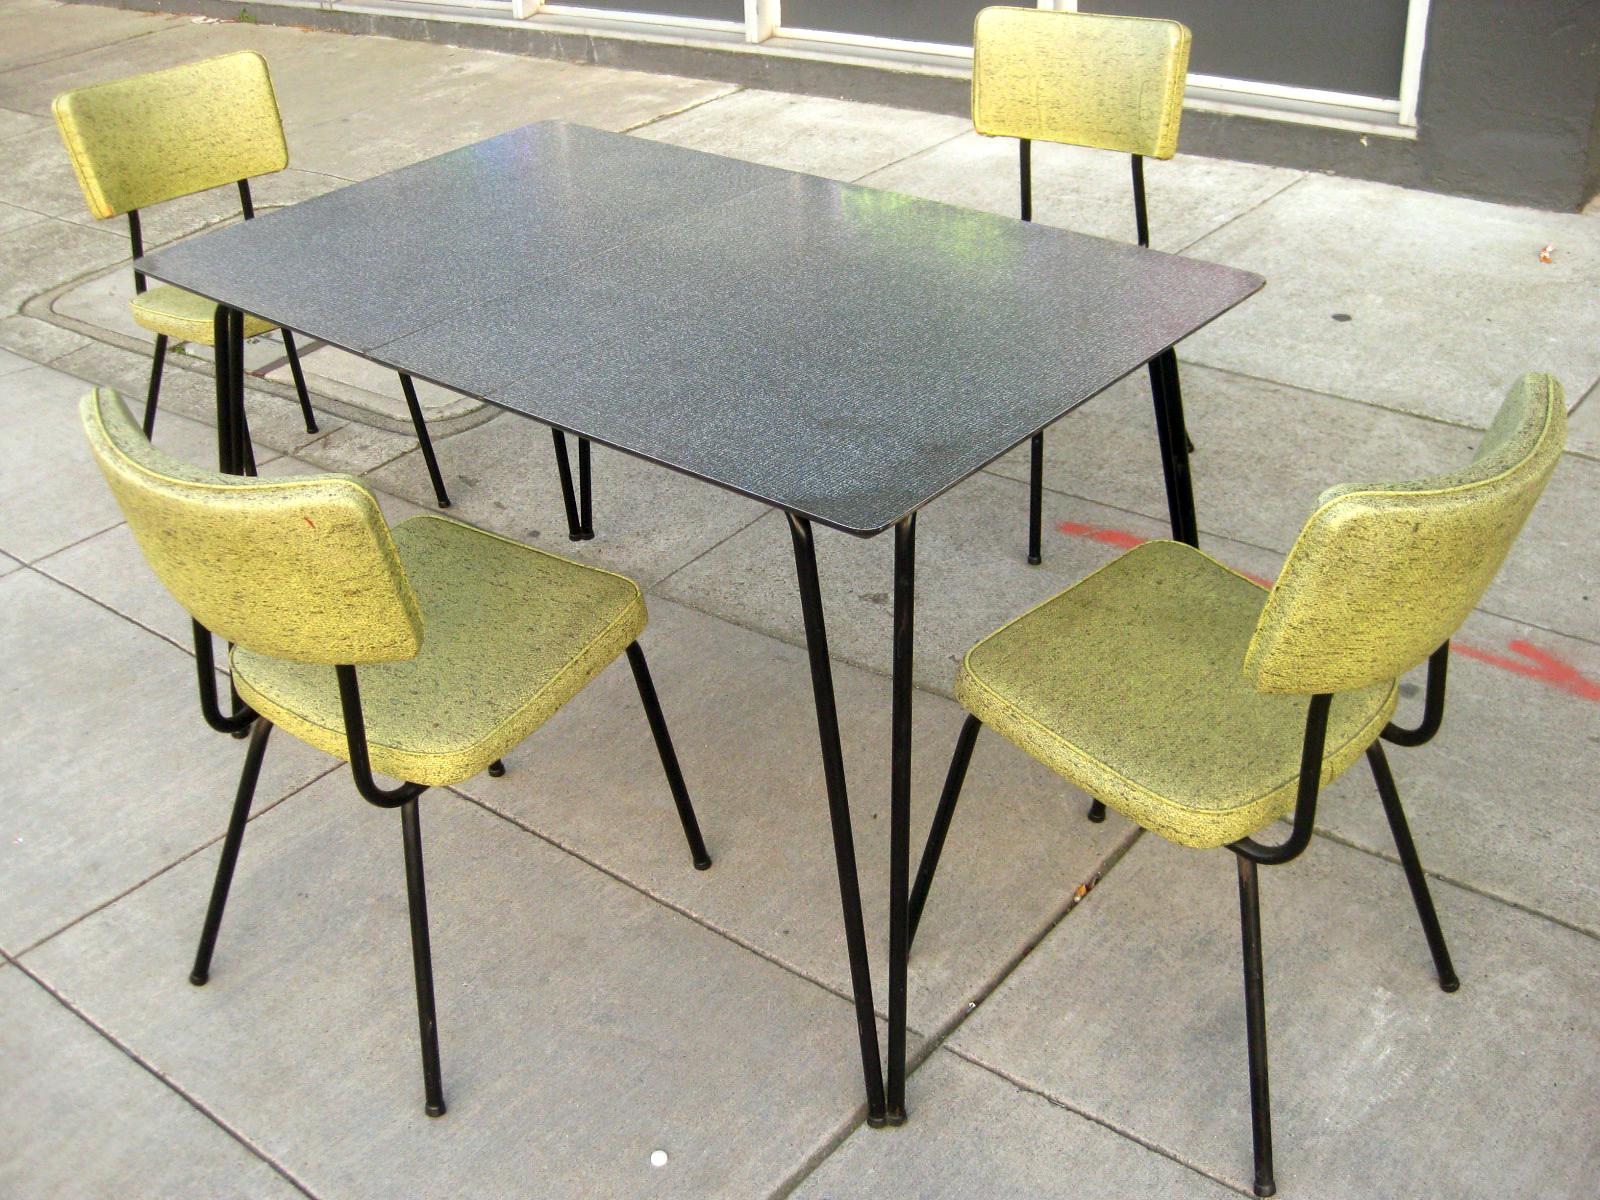 1960s kitchen chairs photo - 1